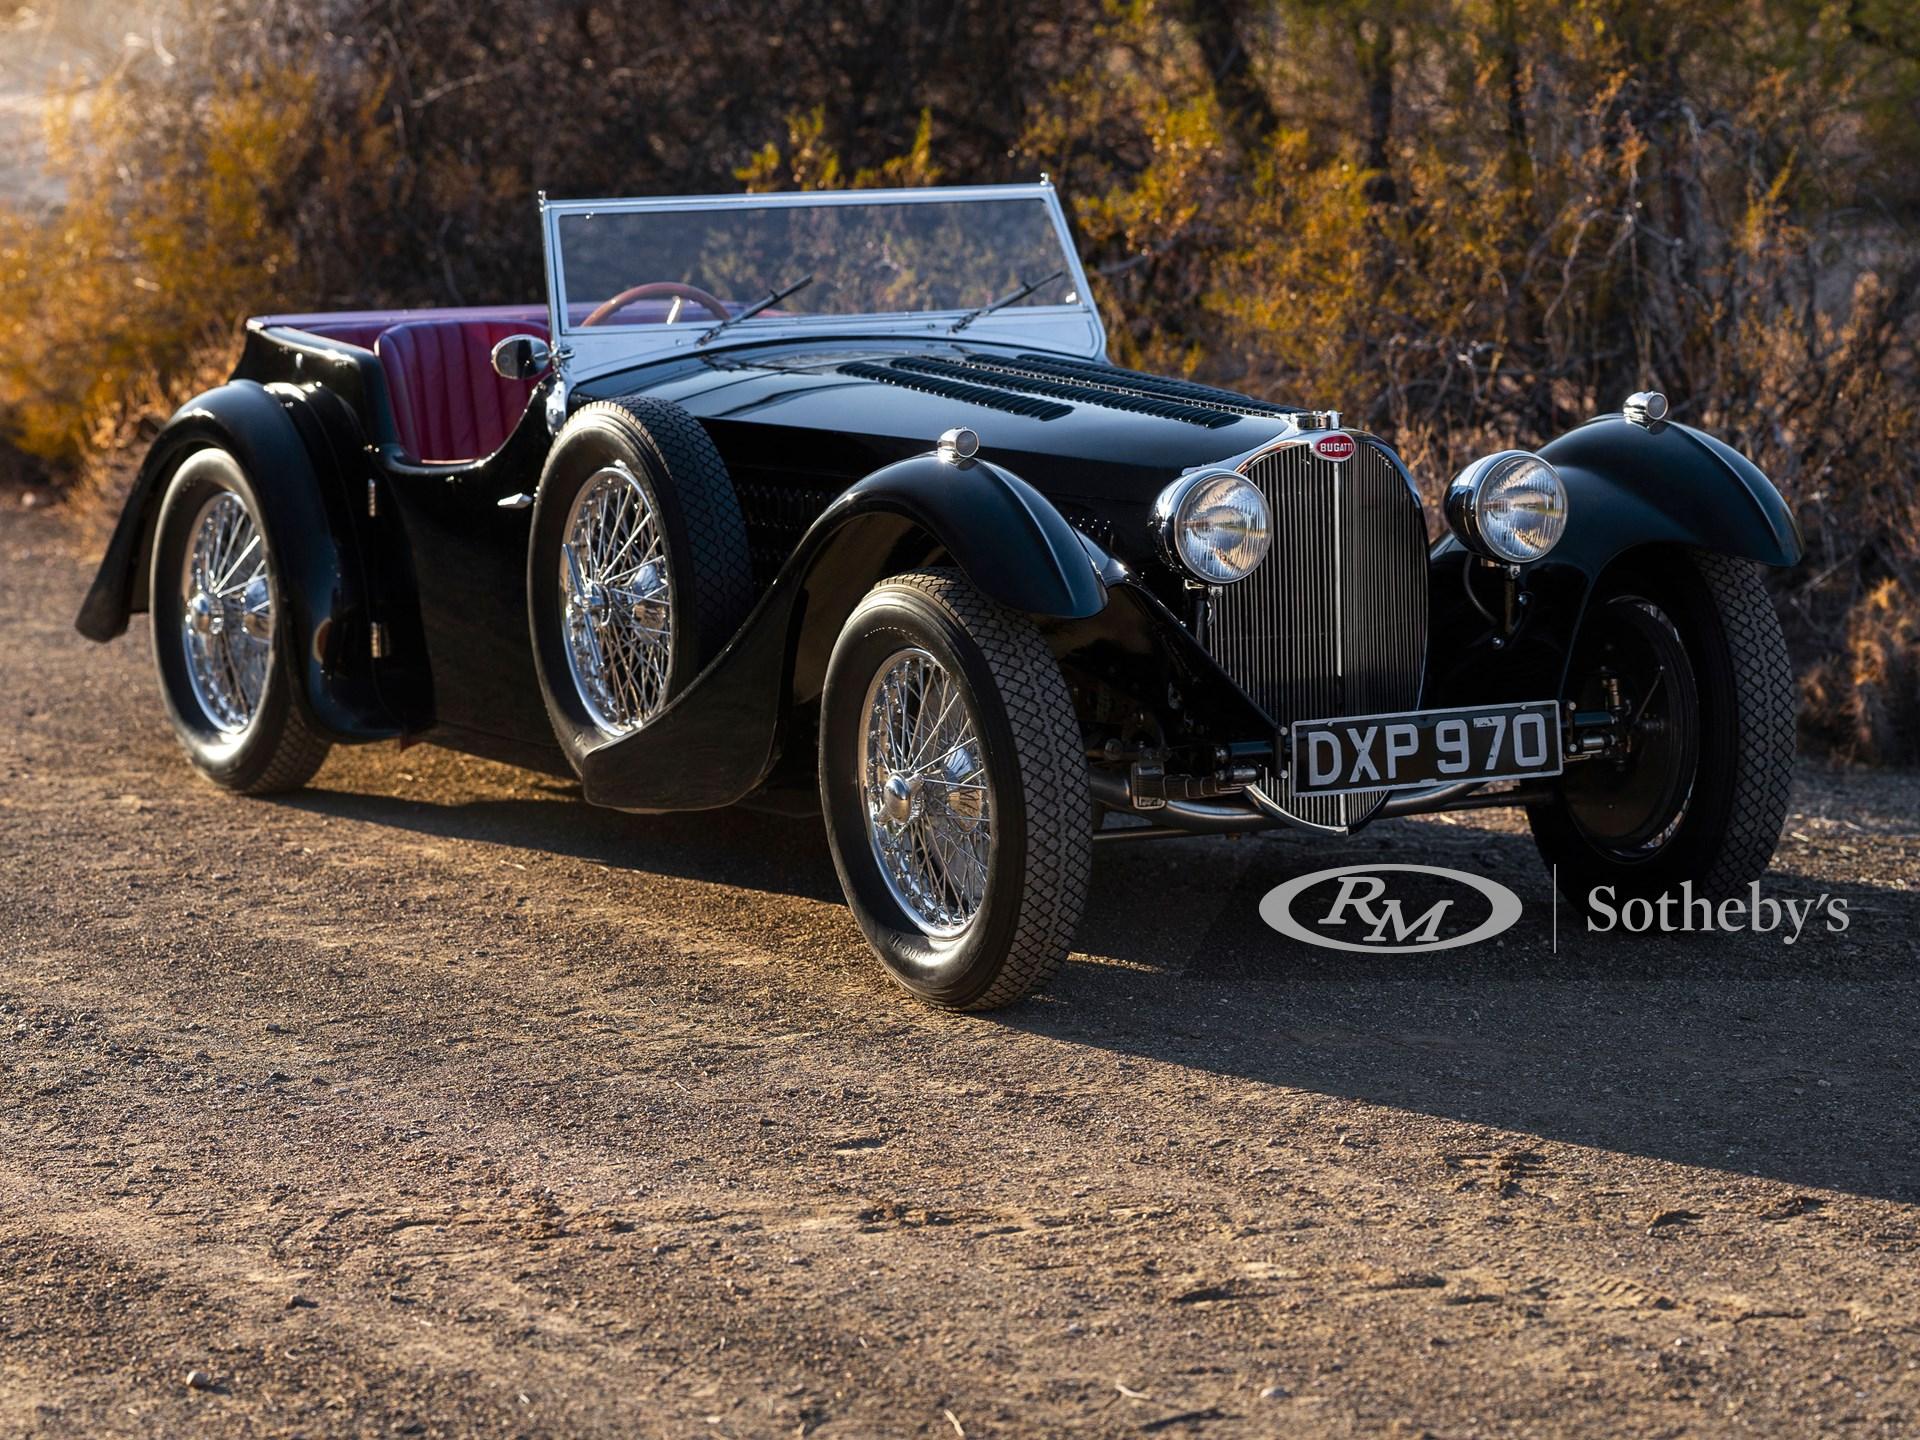 210125 1937 Bugatti Type 57SC Tourer by Corsica Patrick Ernzen © 2020 RM Sothebys